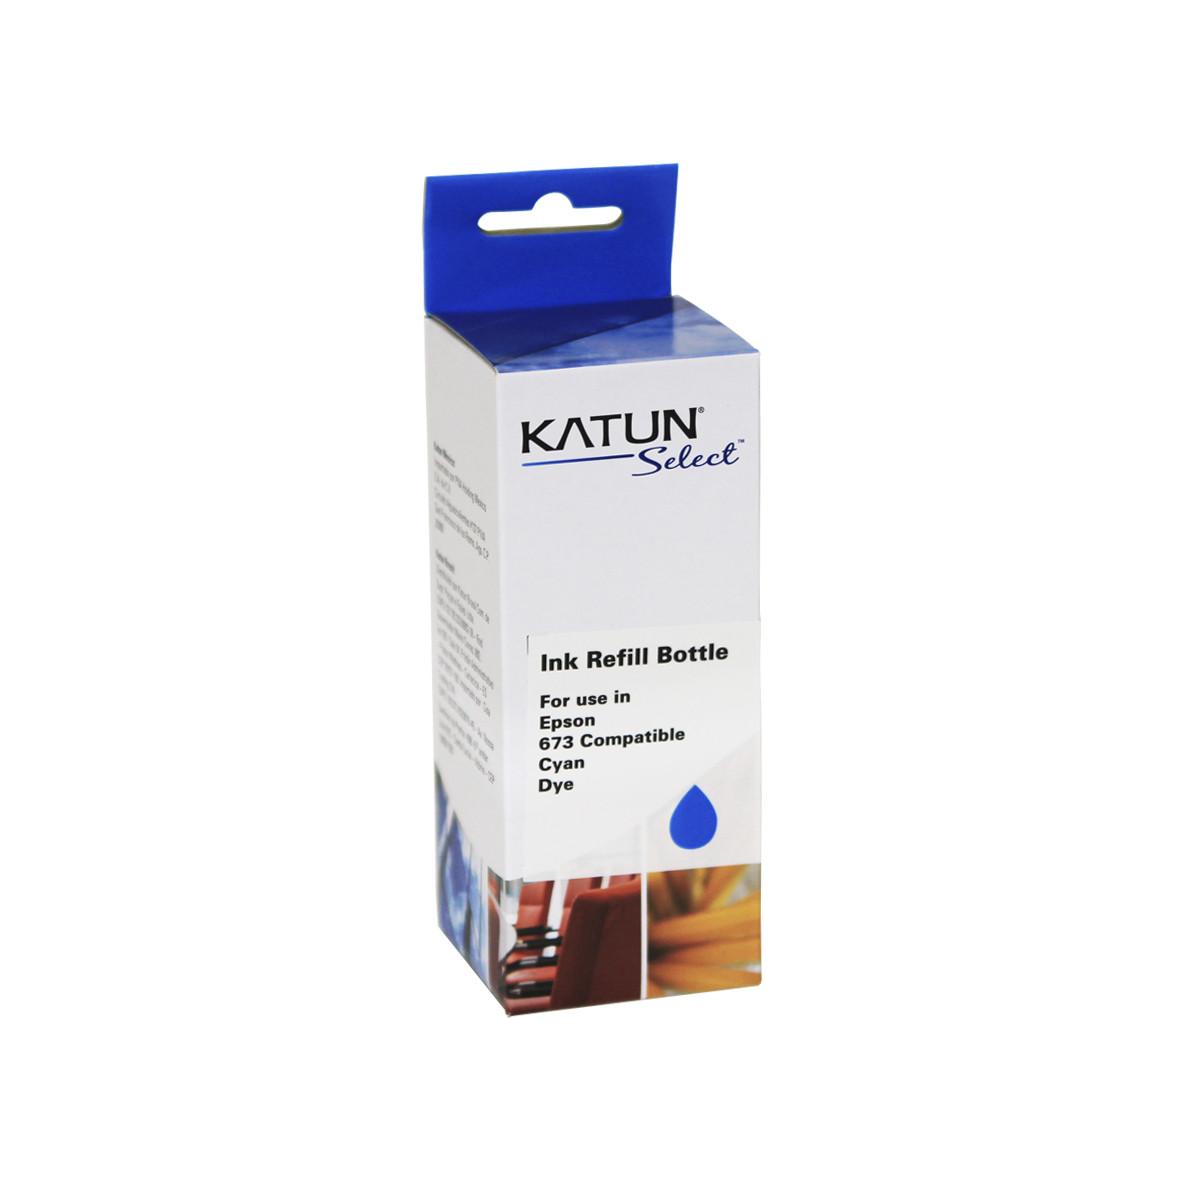 Tinta Compatível com Epson T673 T673220 Ciano | L1800 L800 L805 L810 L850 | Katun Select 100ml